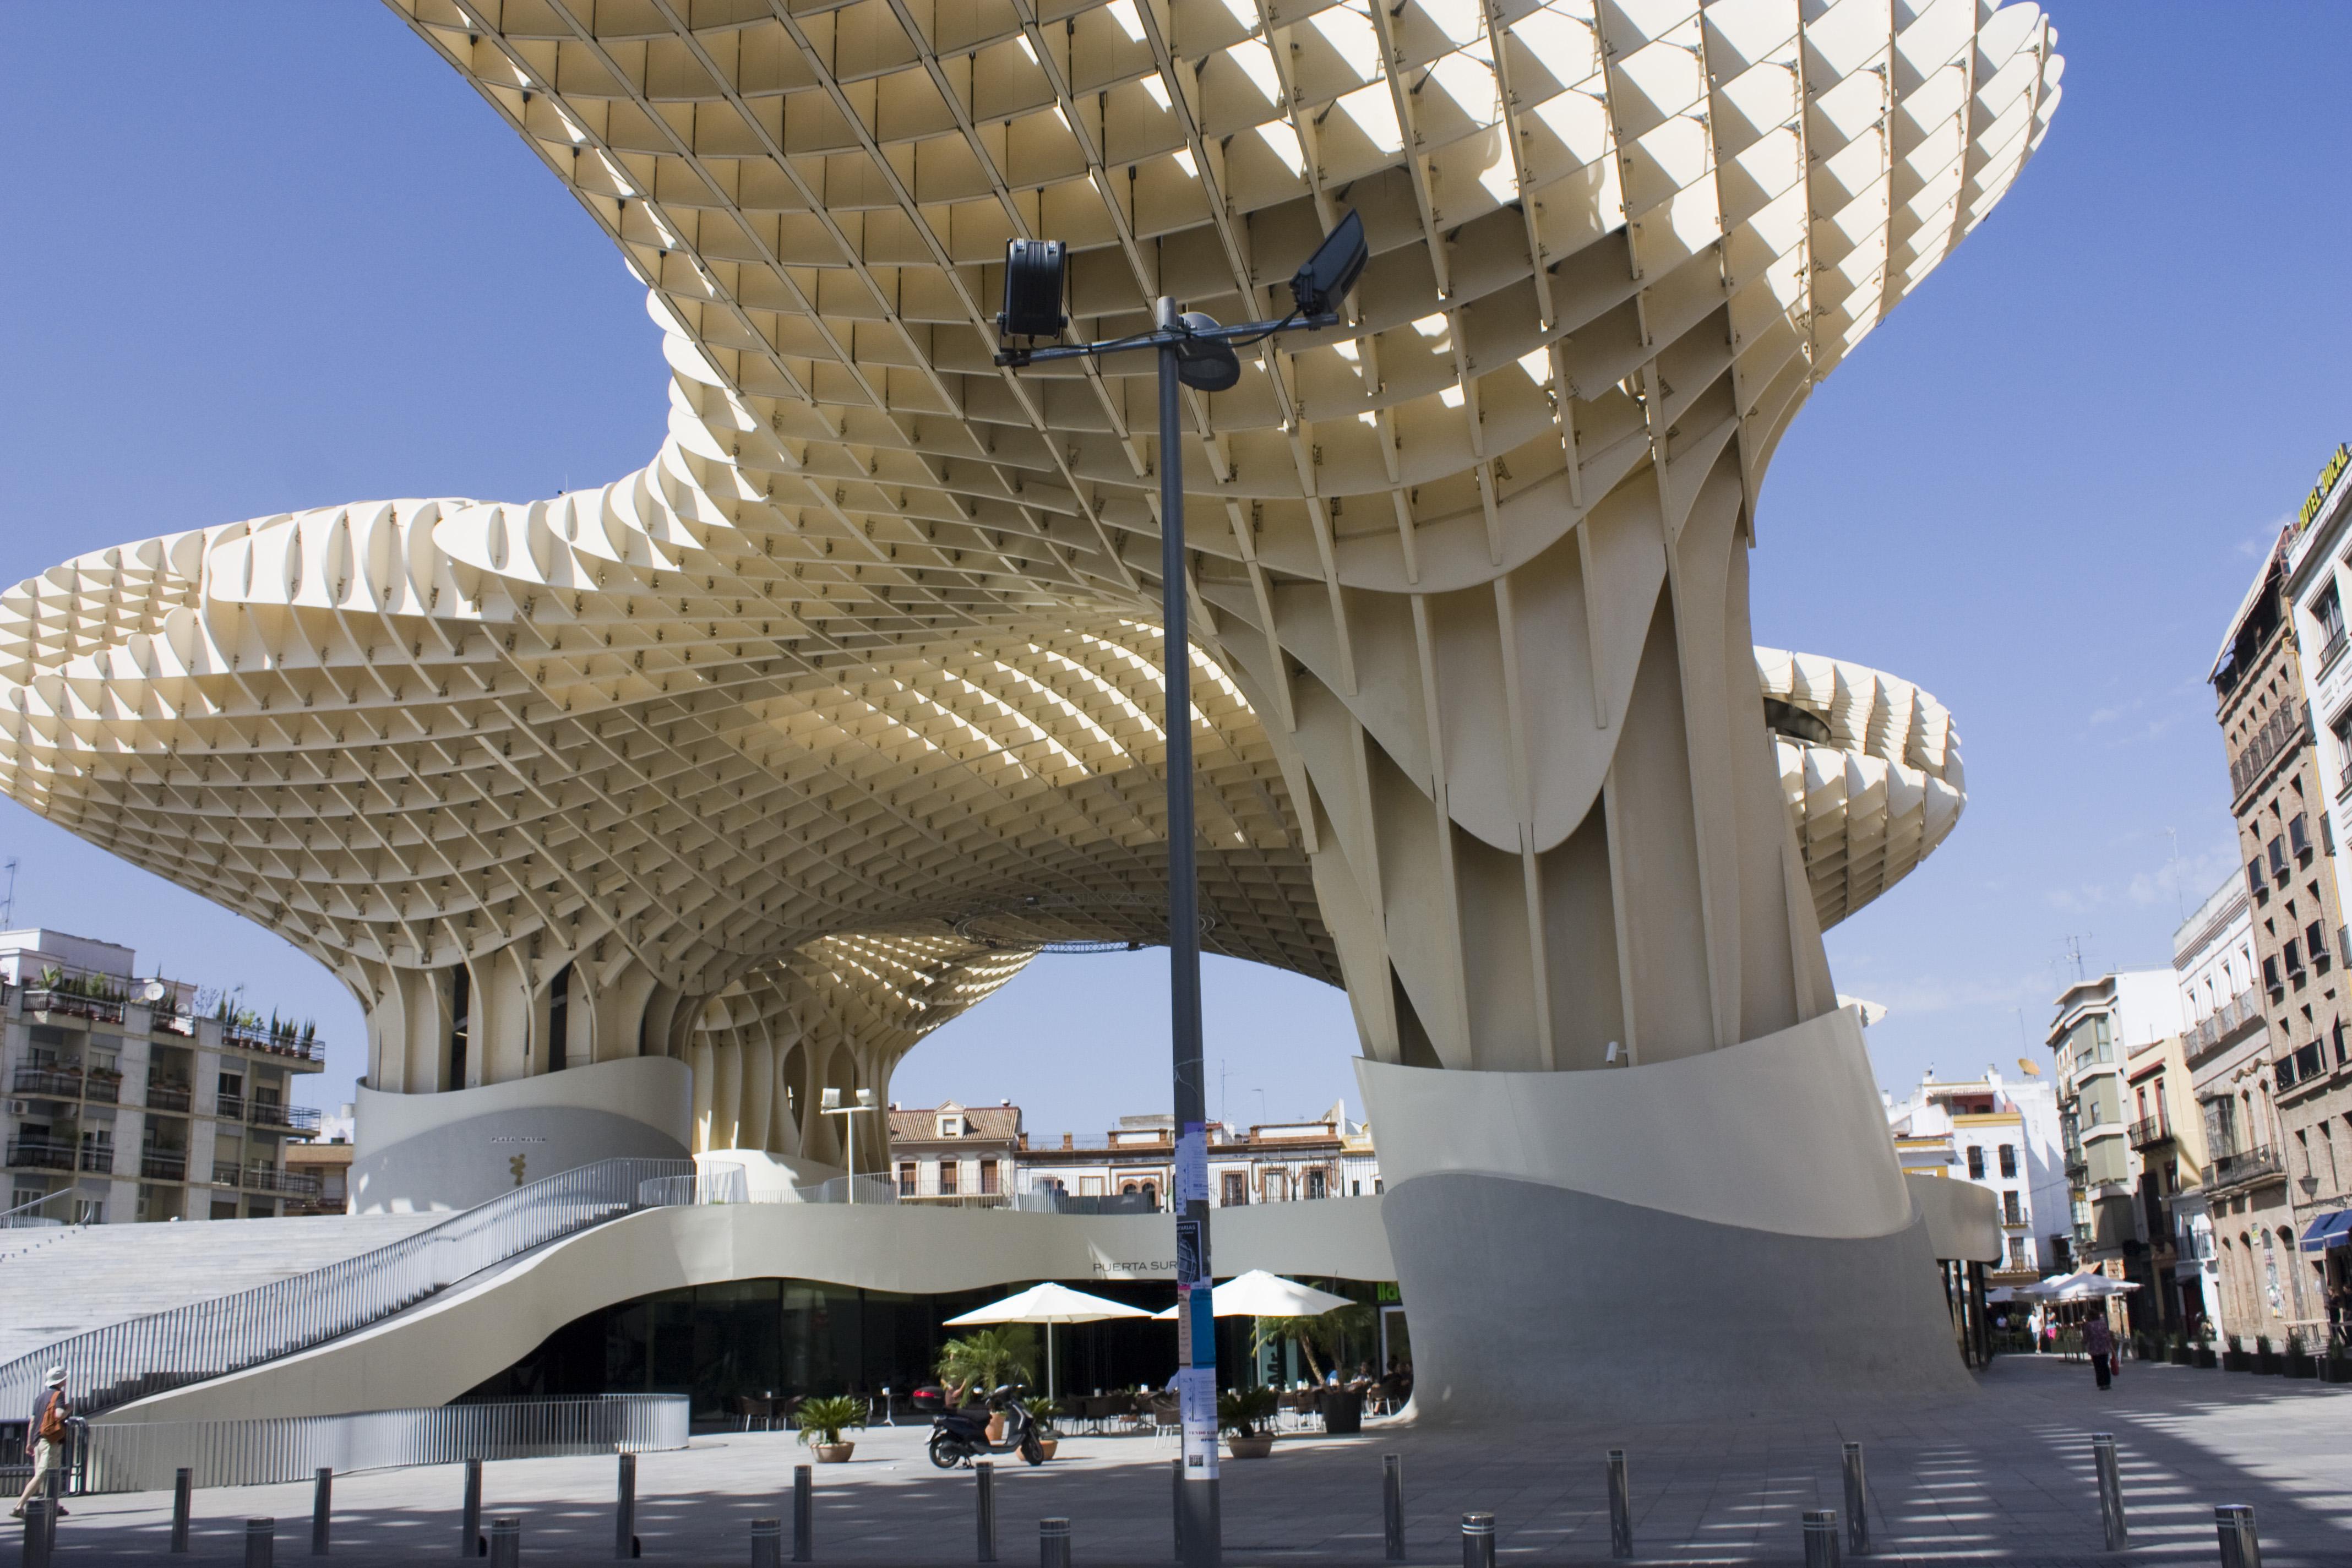 File:Sevilla-Metropol Parasol (Calle Imagen)-20110915.jpg - Wikimedia Commons